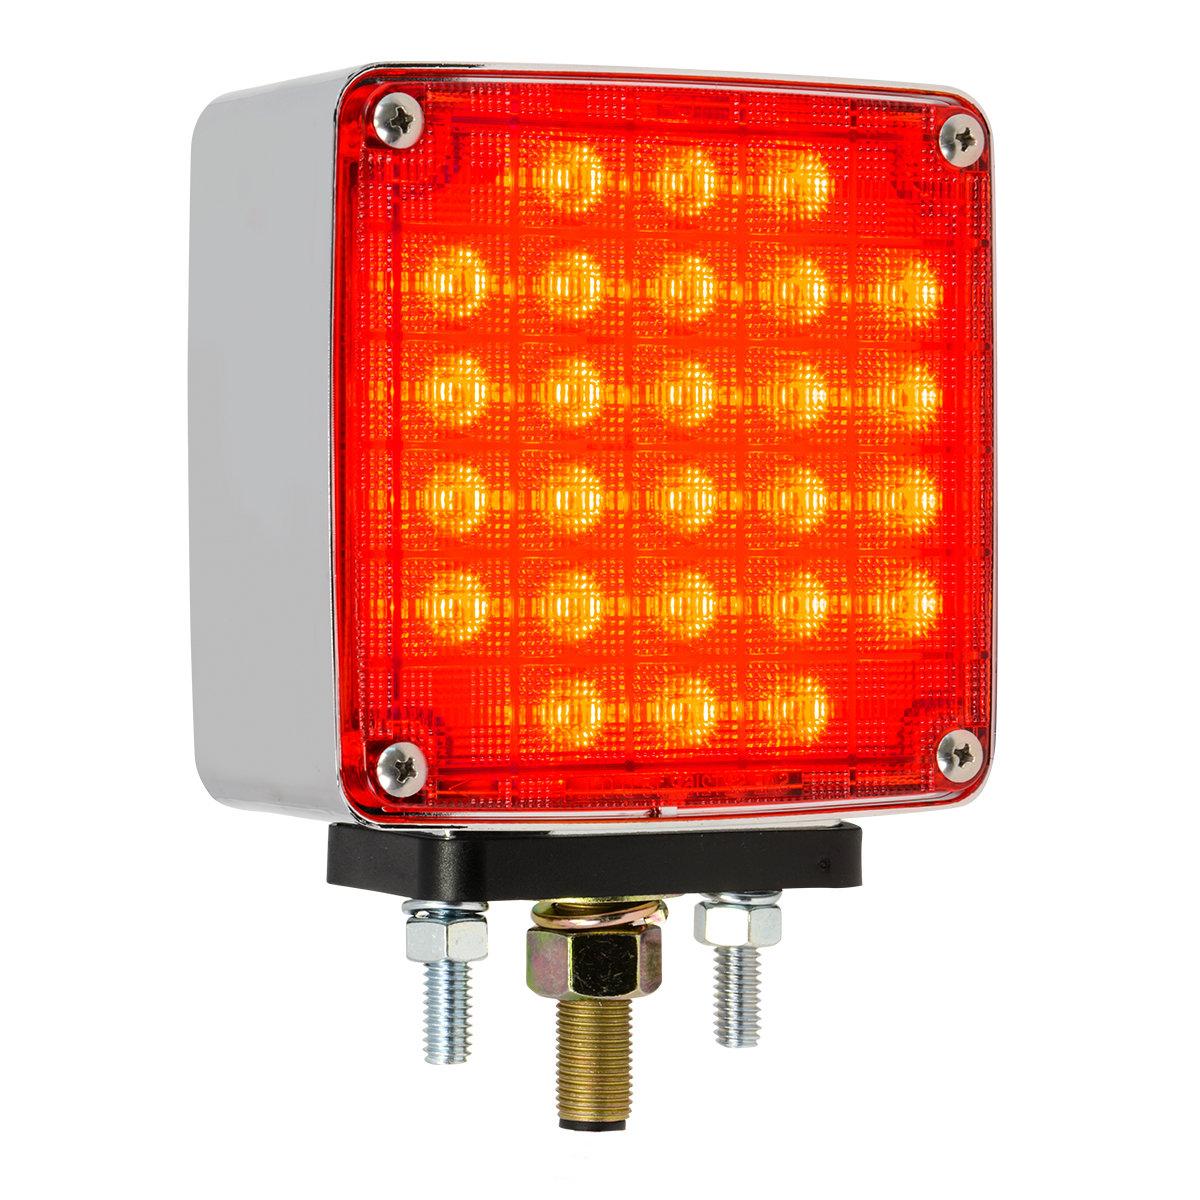 Square Double Face Smart Dynamic LED Light